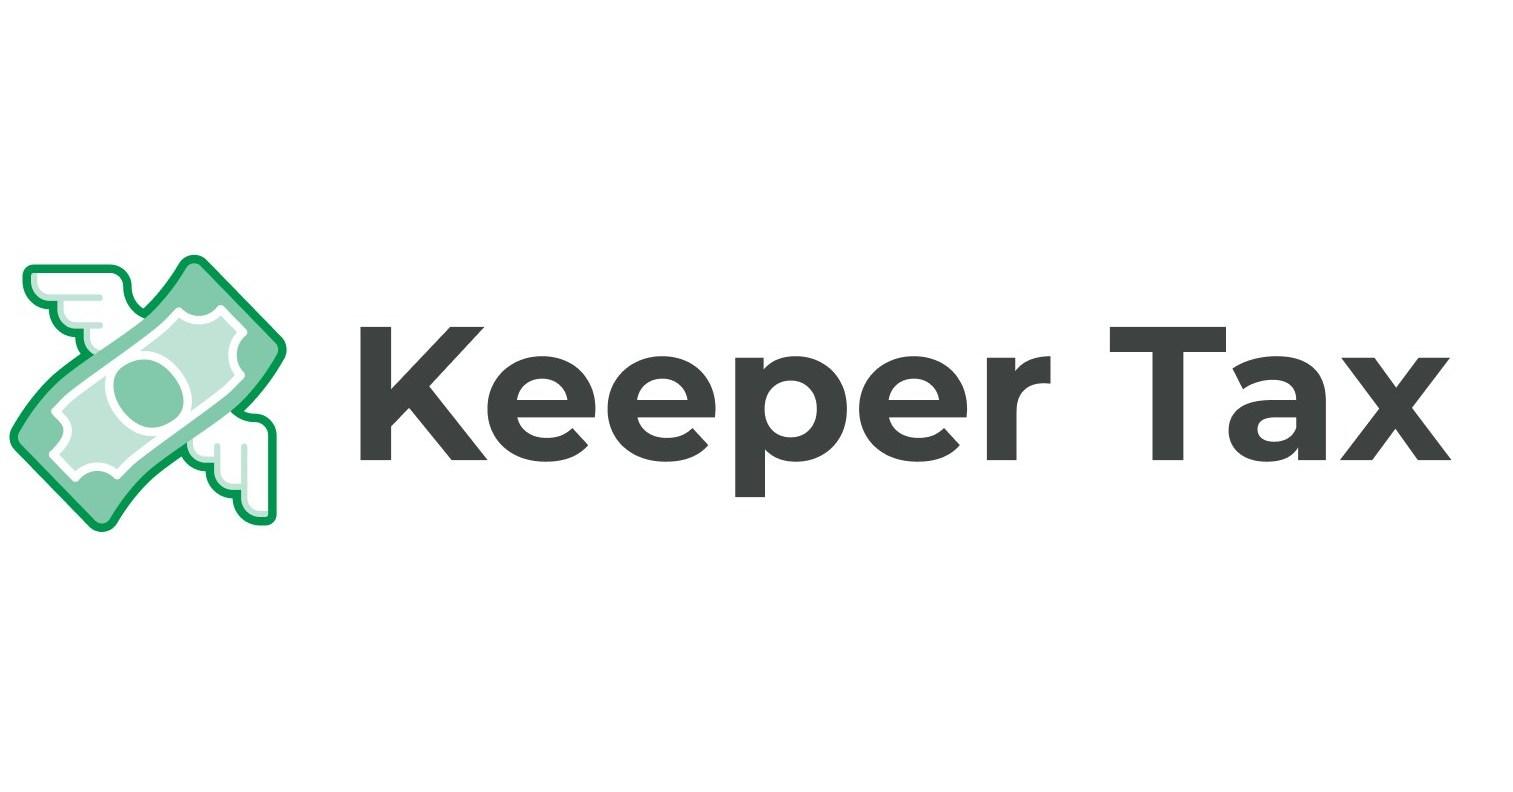 KeeperTax